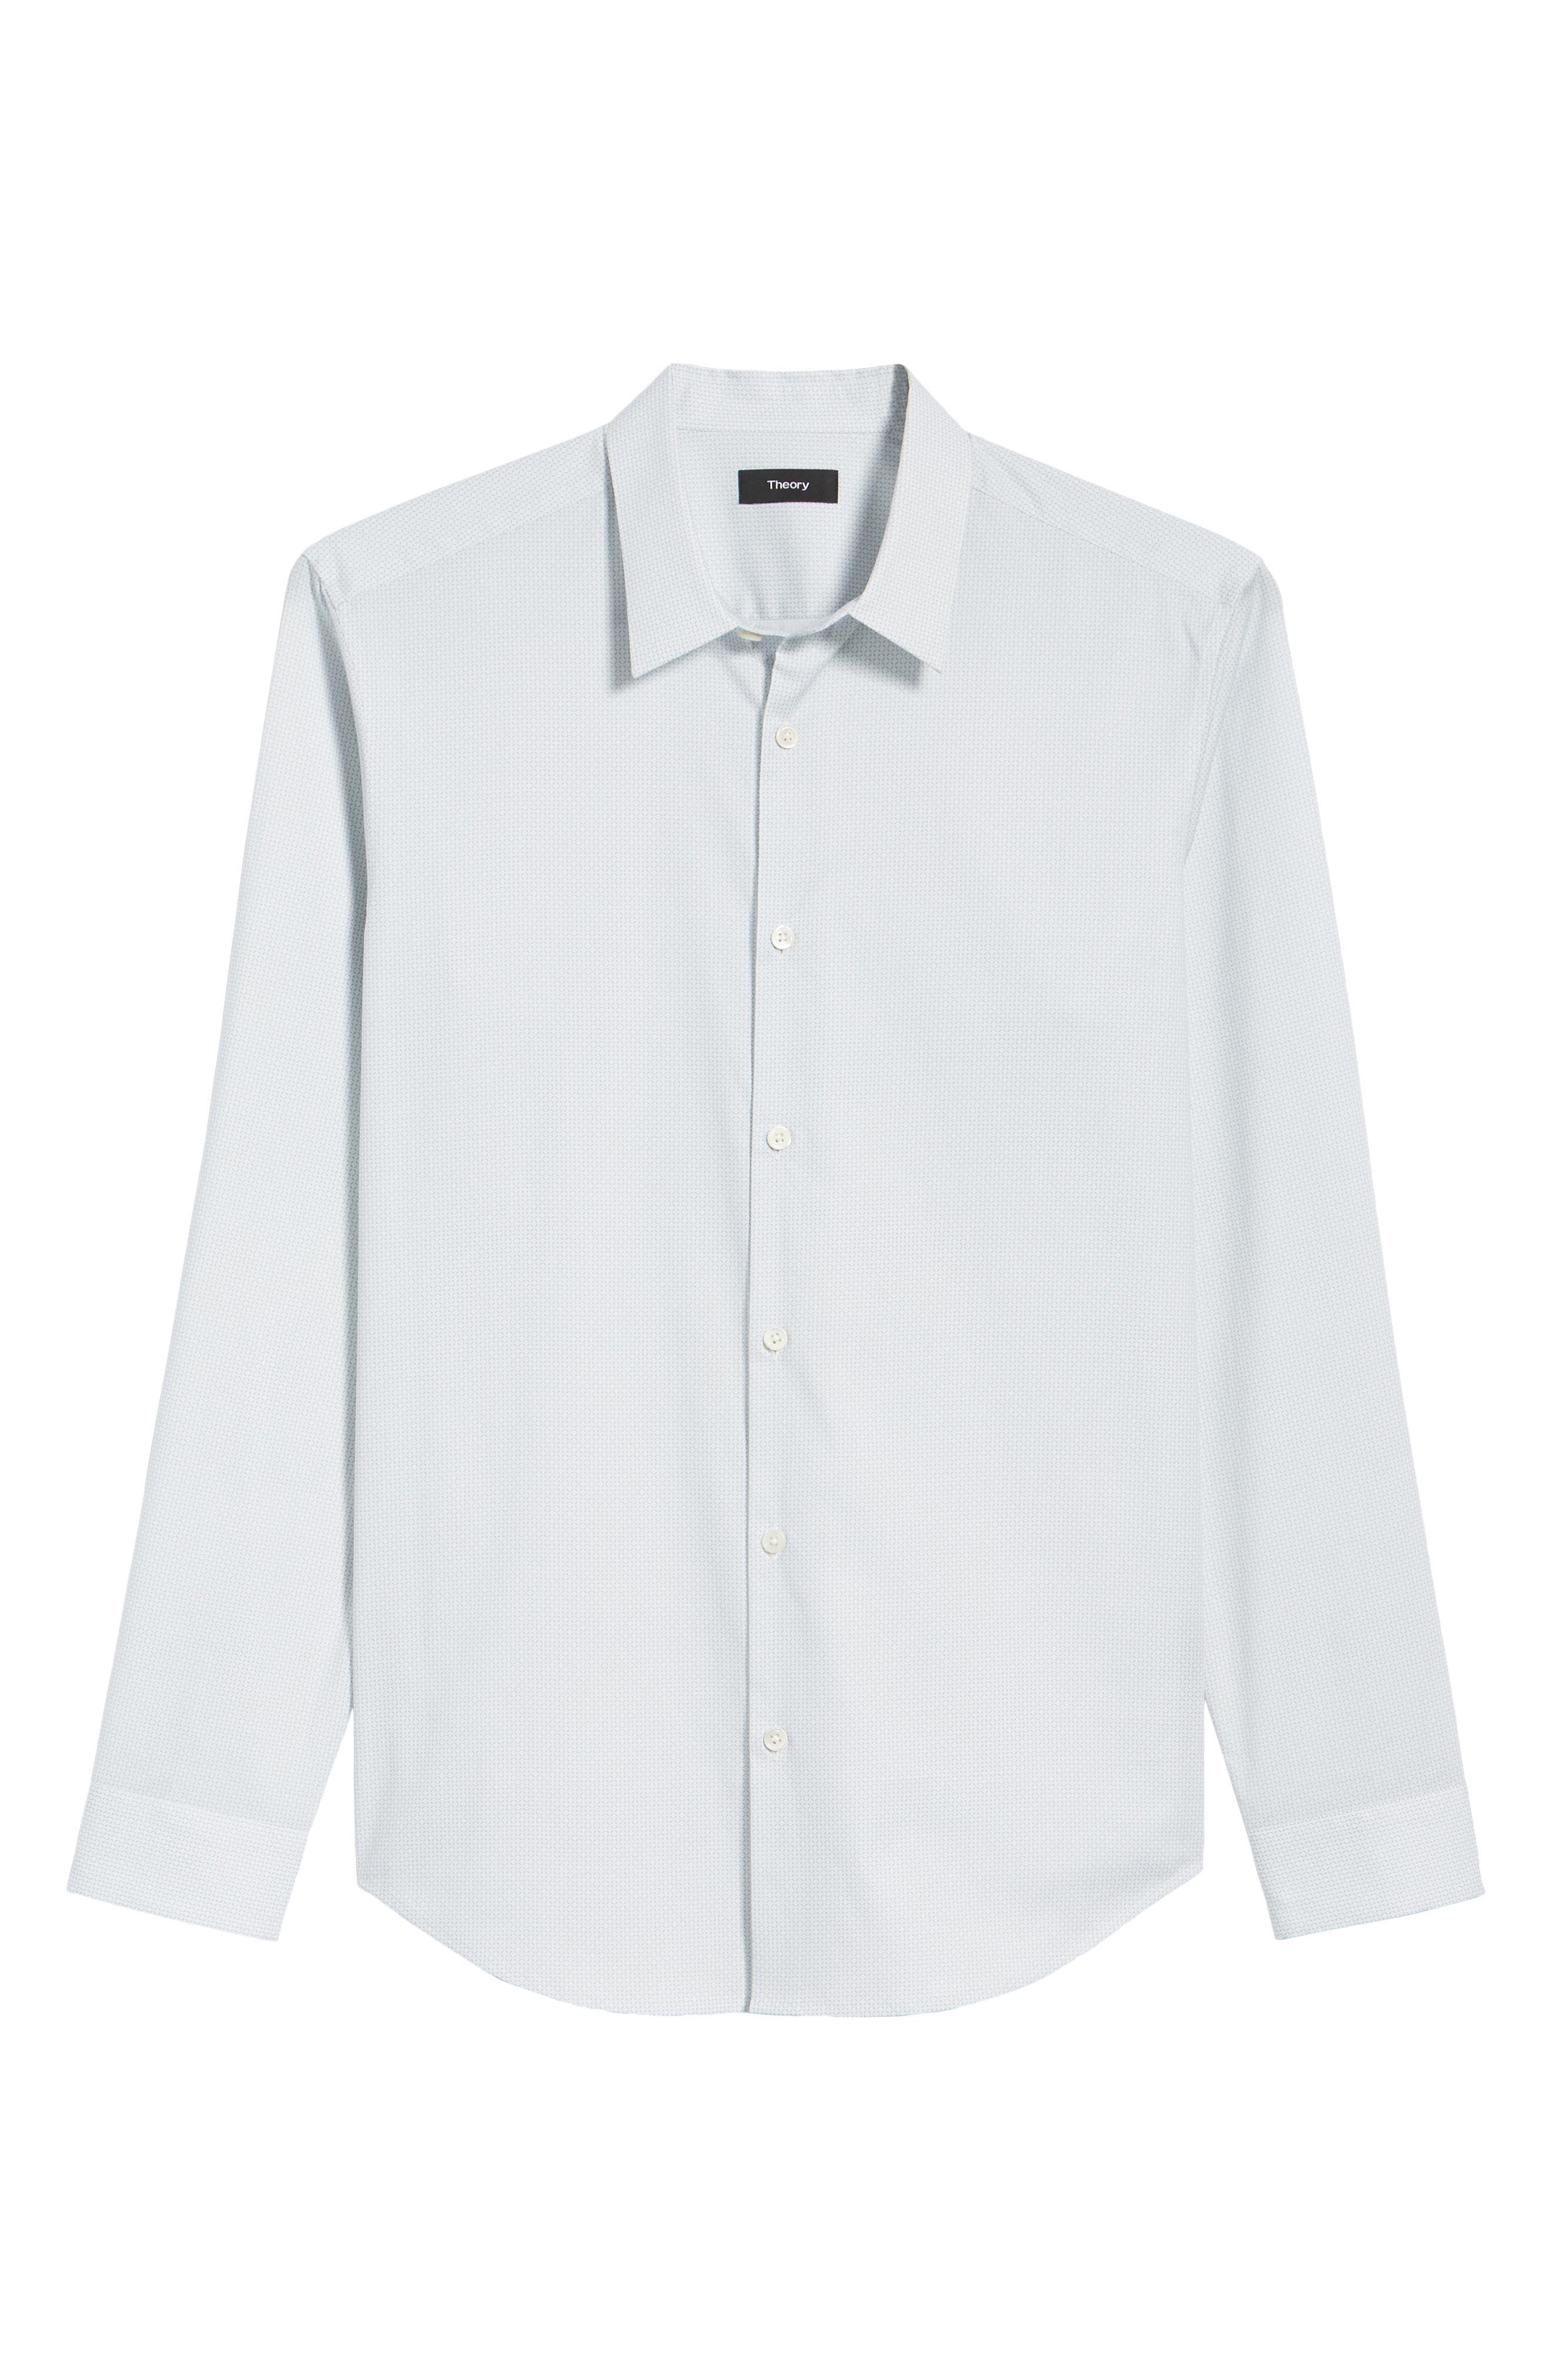 Irving Sillar Slim Fit Sport Shirt,                             Alternate thumbnail 6, color,                             097